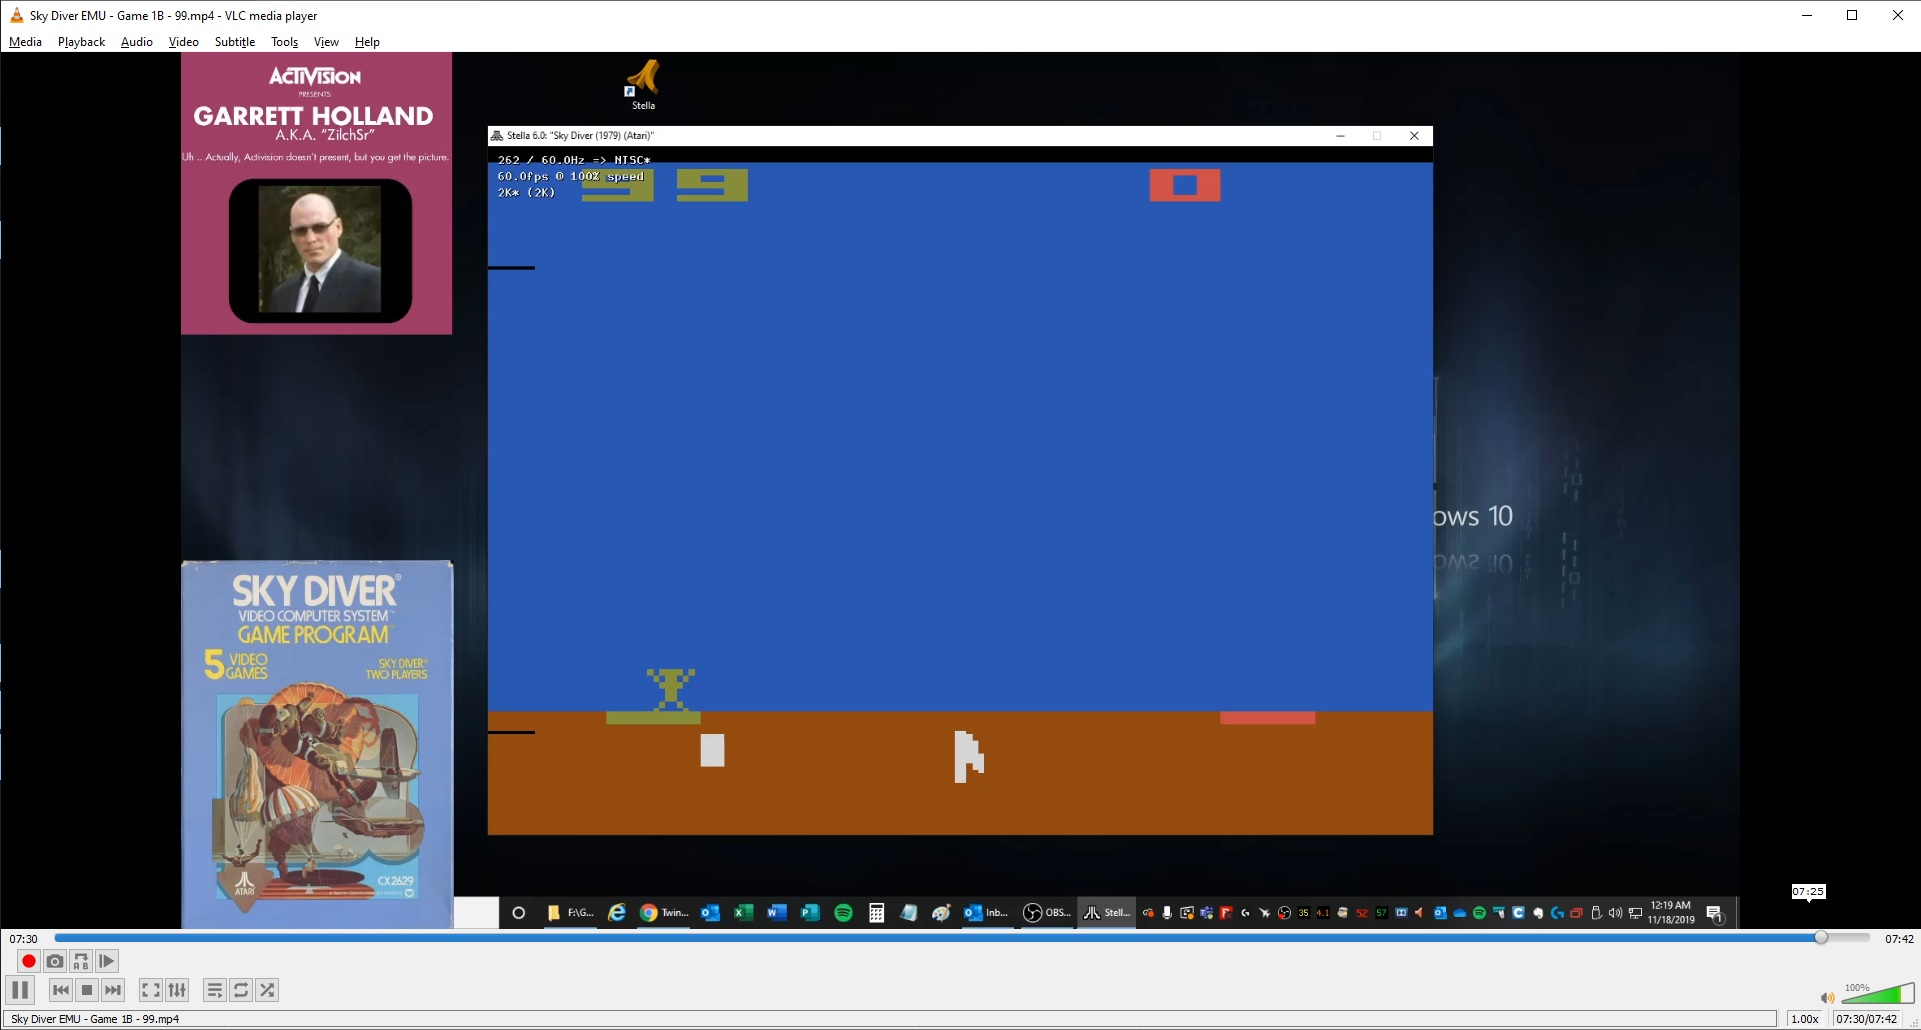 ZilchSr: Sky Diver (Atari 2600 Emulated Novice/B Mode) 99 points on 2019-11-20 22:26:39